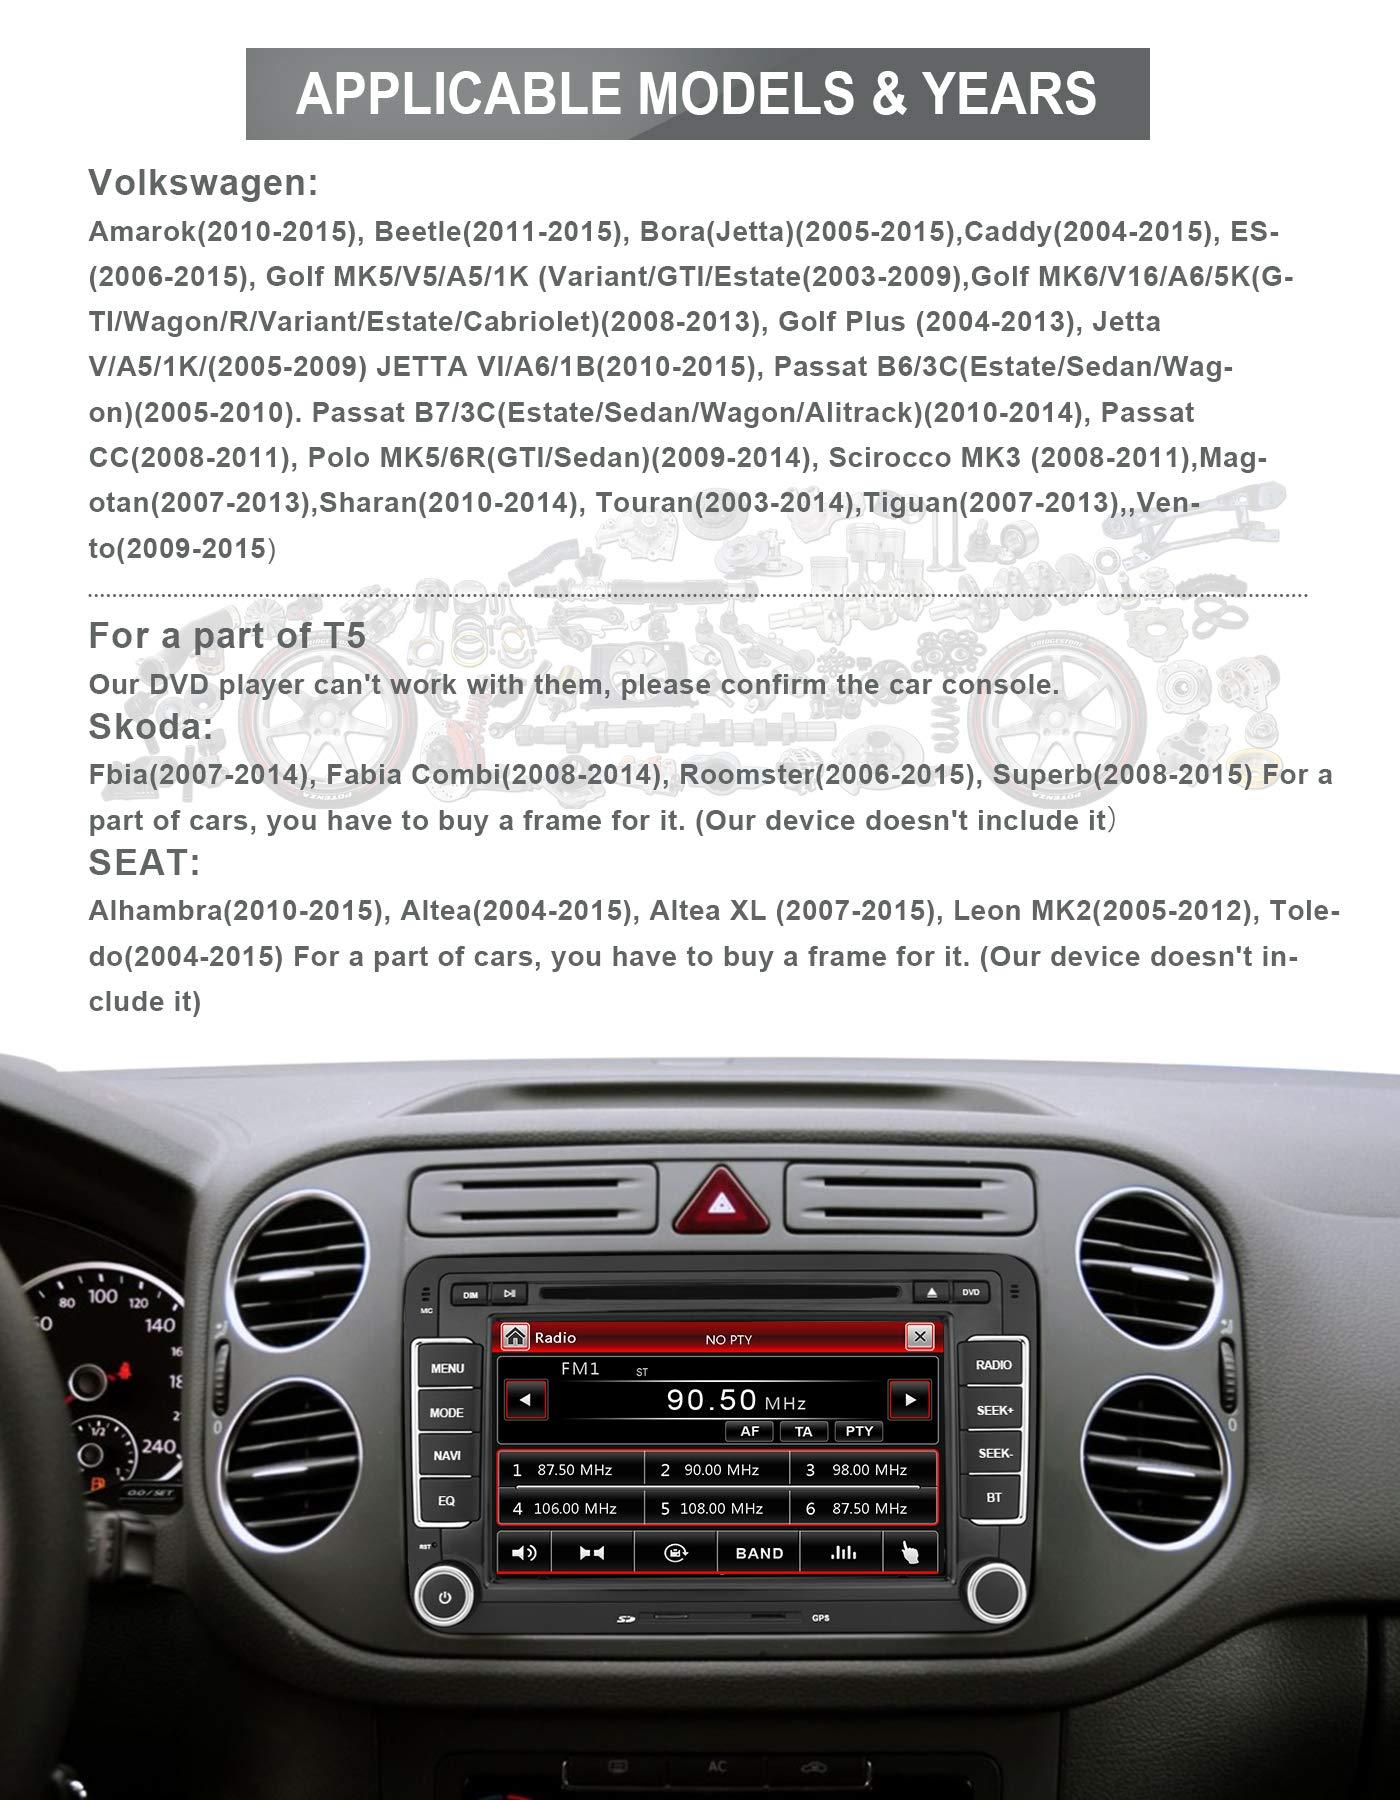 Aumume-7-Zoll-Autoradio-fr-Golf-VW-Skoda-Seat-mit-Navi-Bluetooth-Untersttzung-GPS-Navigation-Radio-Parkkamera-Lenkradsteuerung-mit-8-GB-Karte